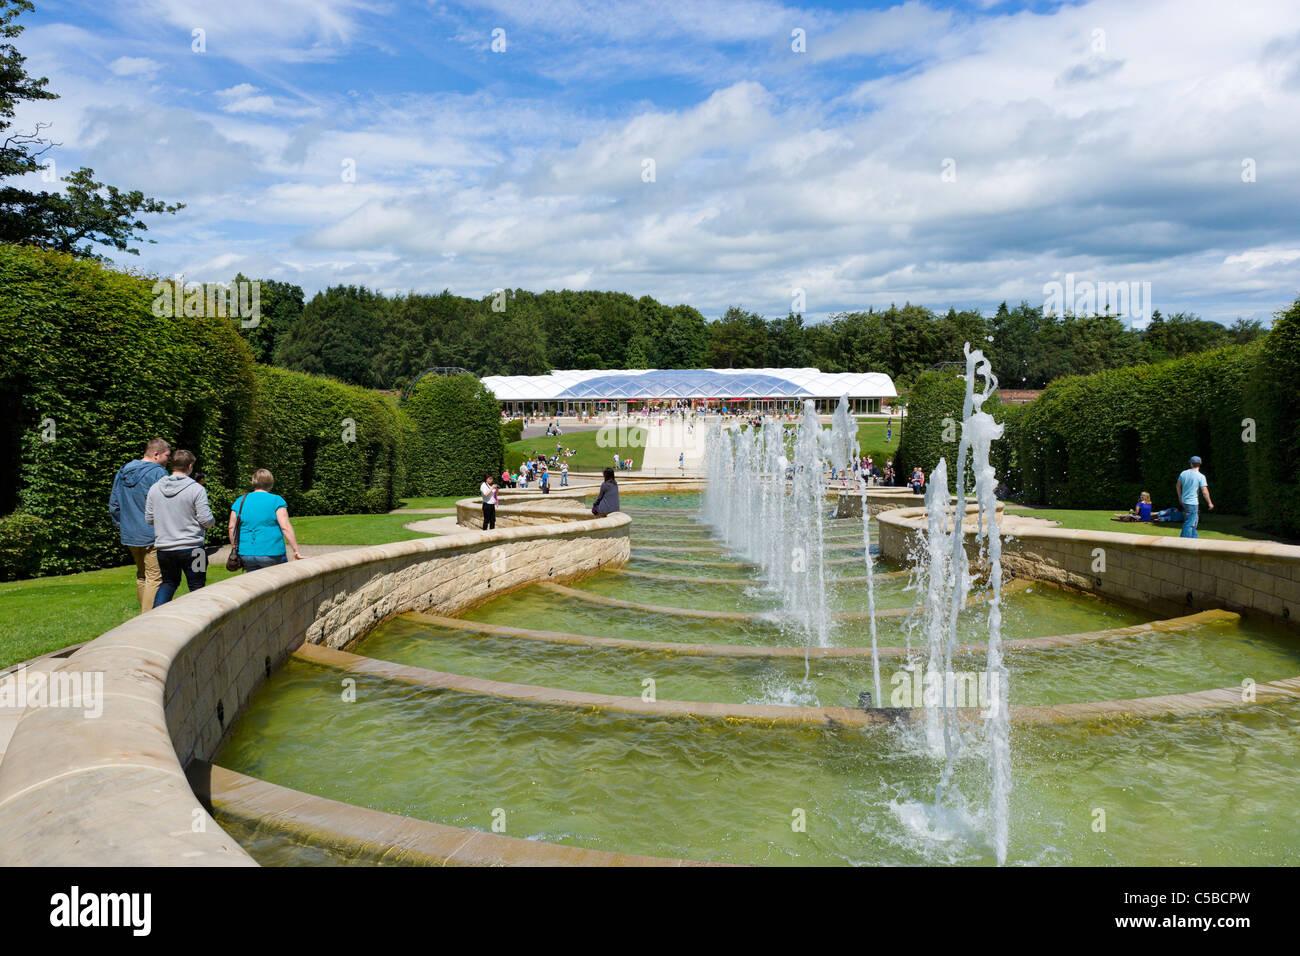 The Grand Cascade, The Alnwick Garden, Alnwick Castle, Alnwick, Northumberland, North East England, UK - Stock Image